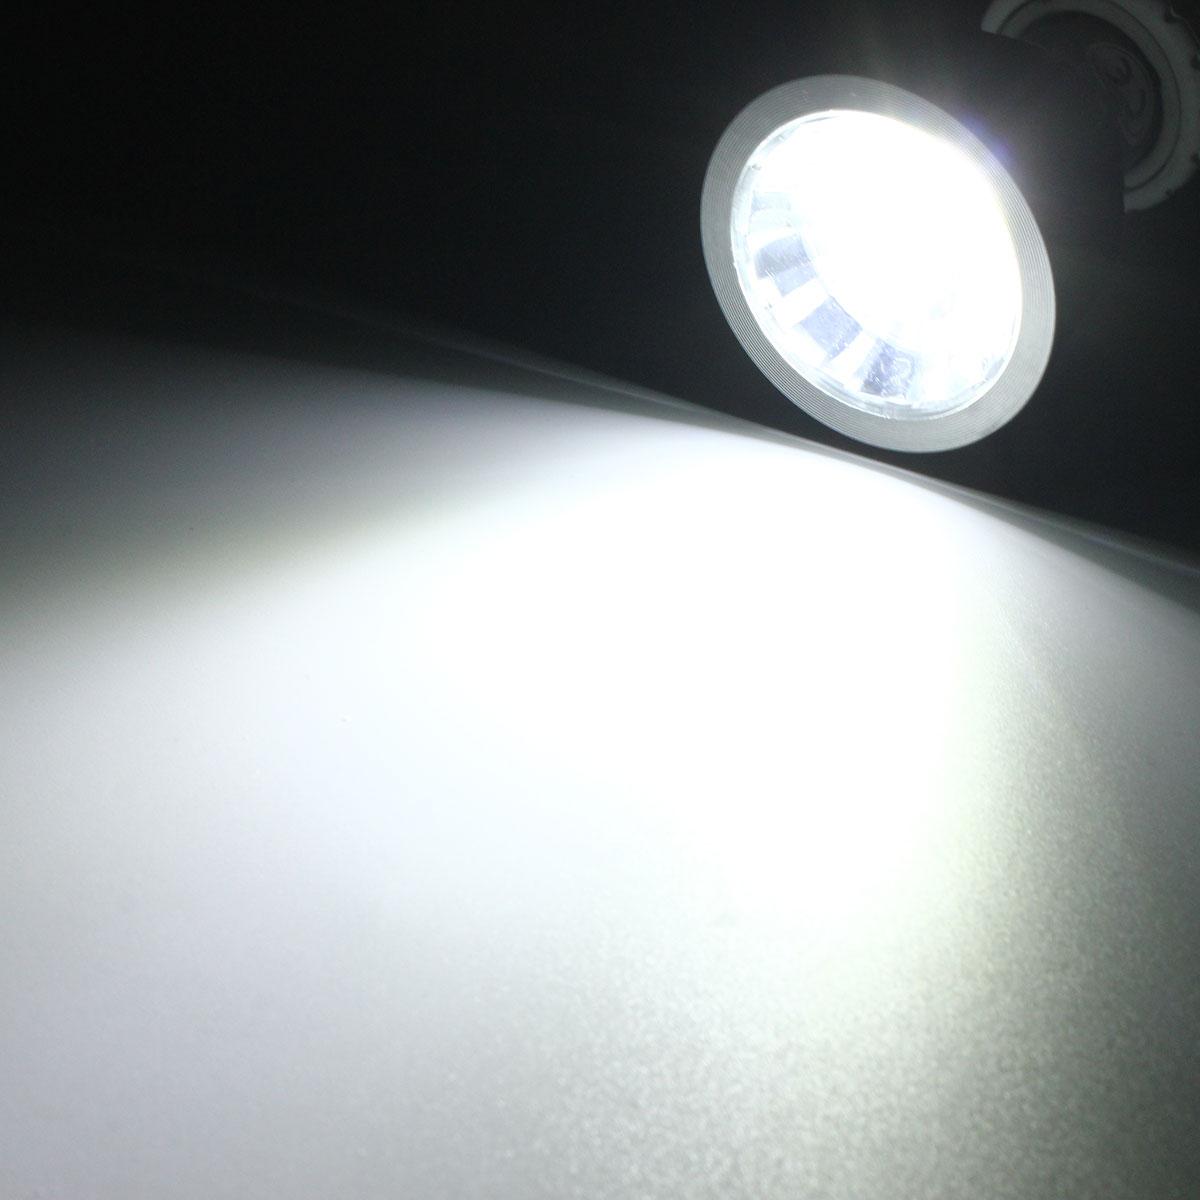 dimmable 6w led ultra bright gu10 cob led spotlight light bulb ac110v 220v. Black Bedroom Furniture Sets. Home Design Ideas